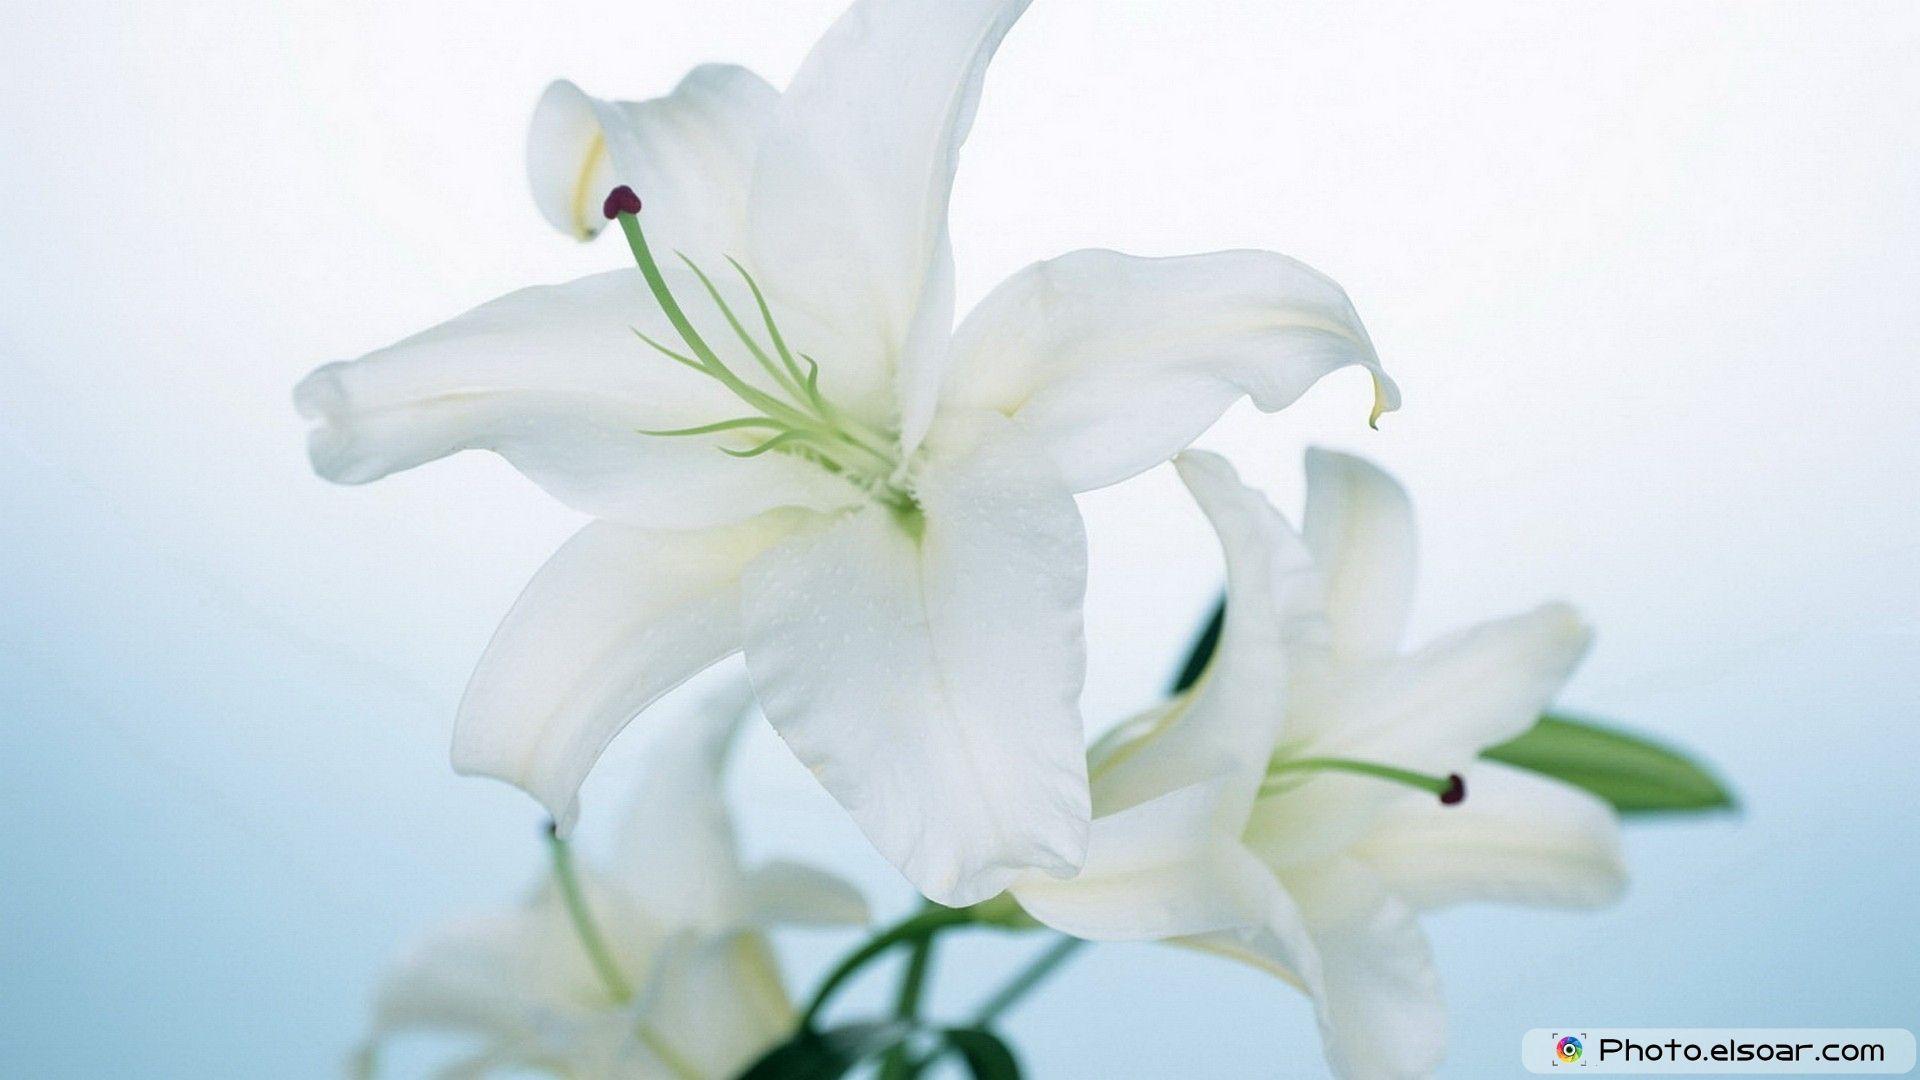 Beautiful white flowers flower wallpaper hd wallpapers pinterest beautiful white flowers flower wallpaper izmirmasajfo